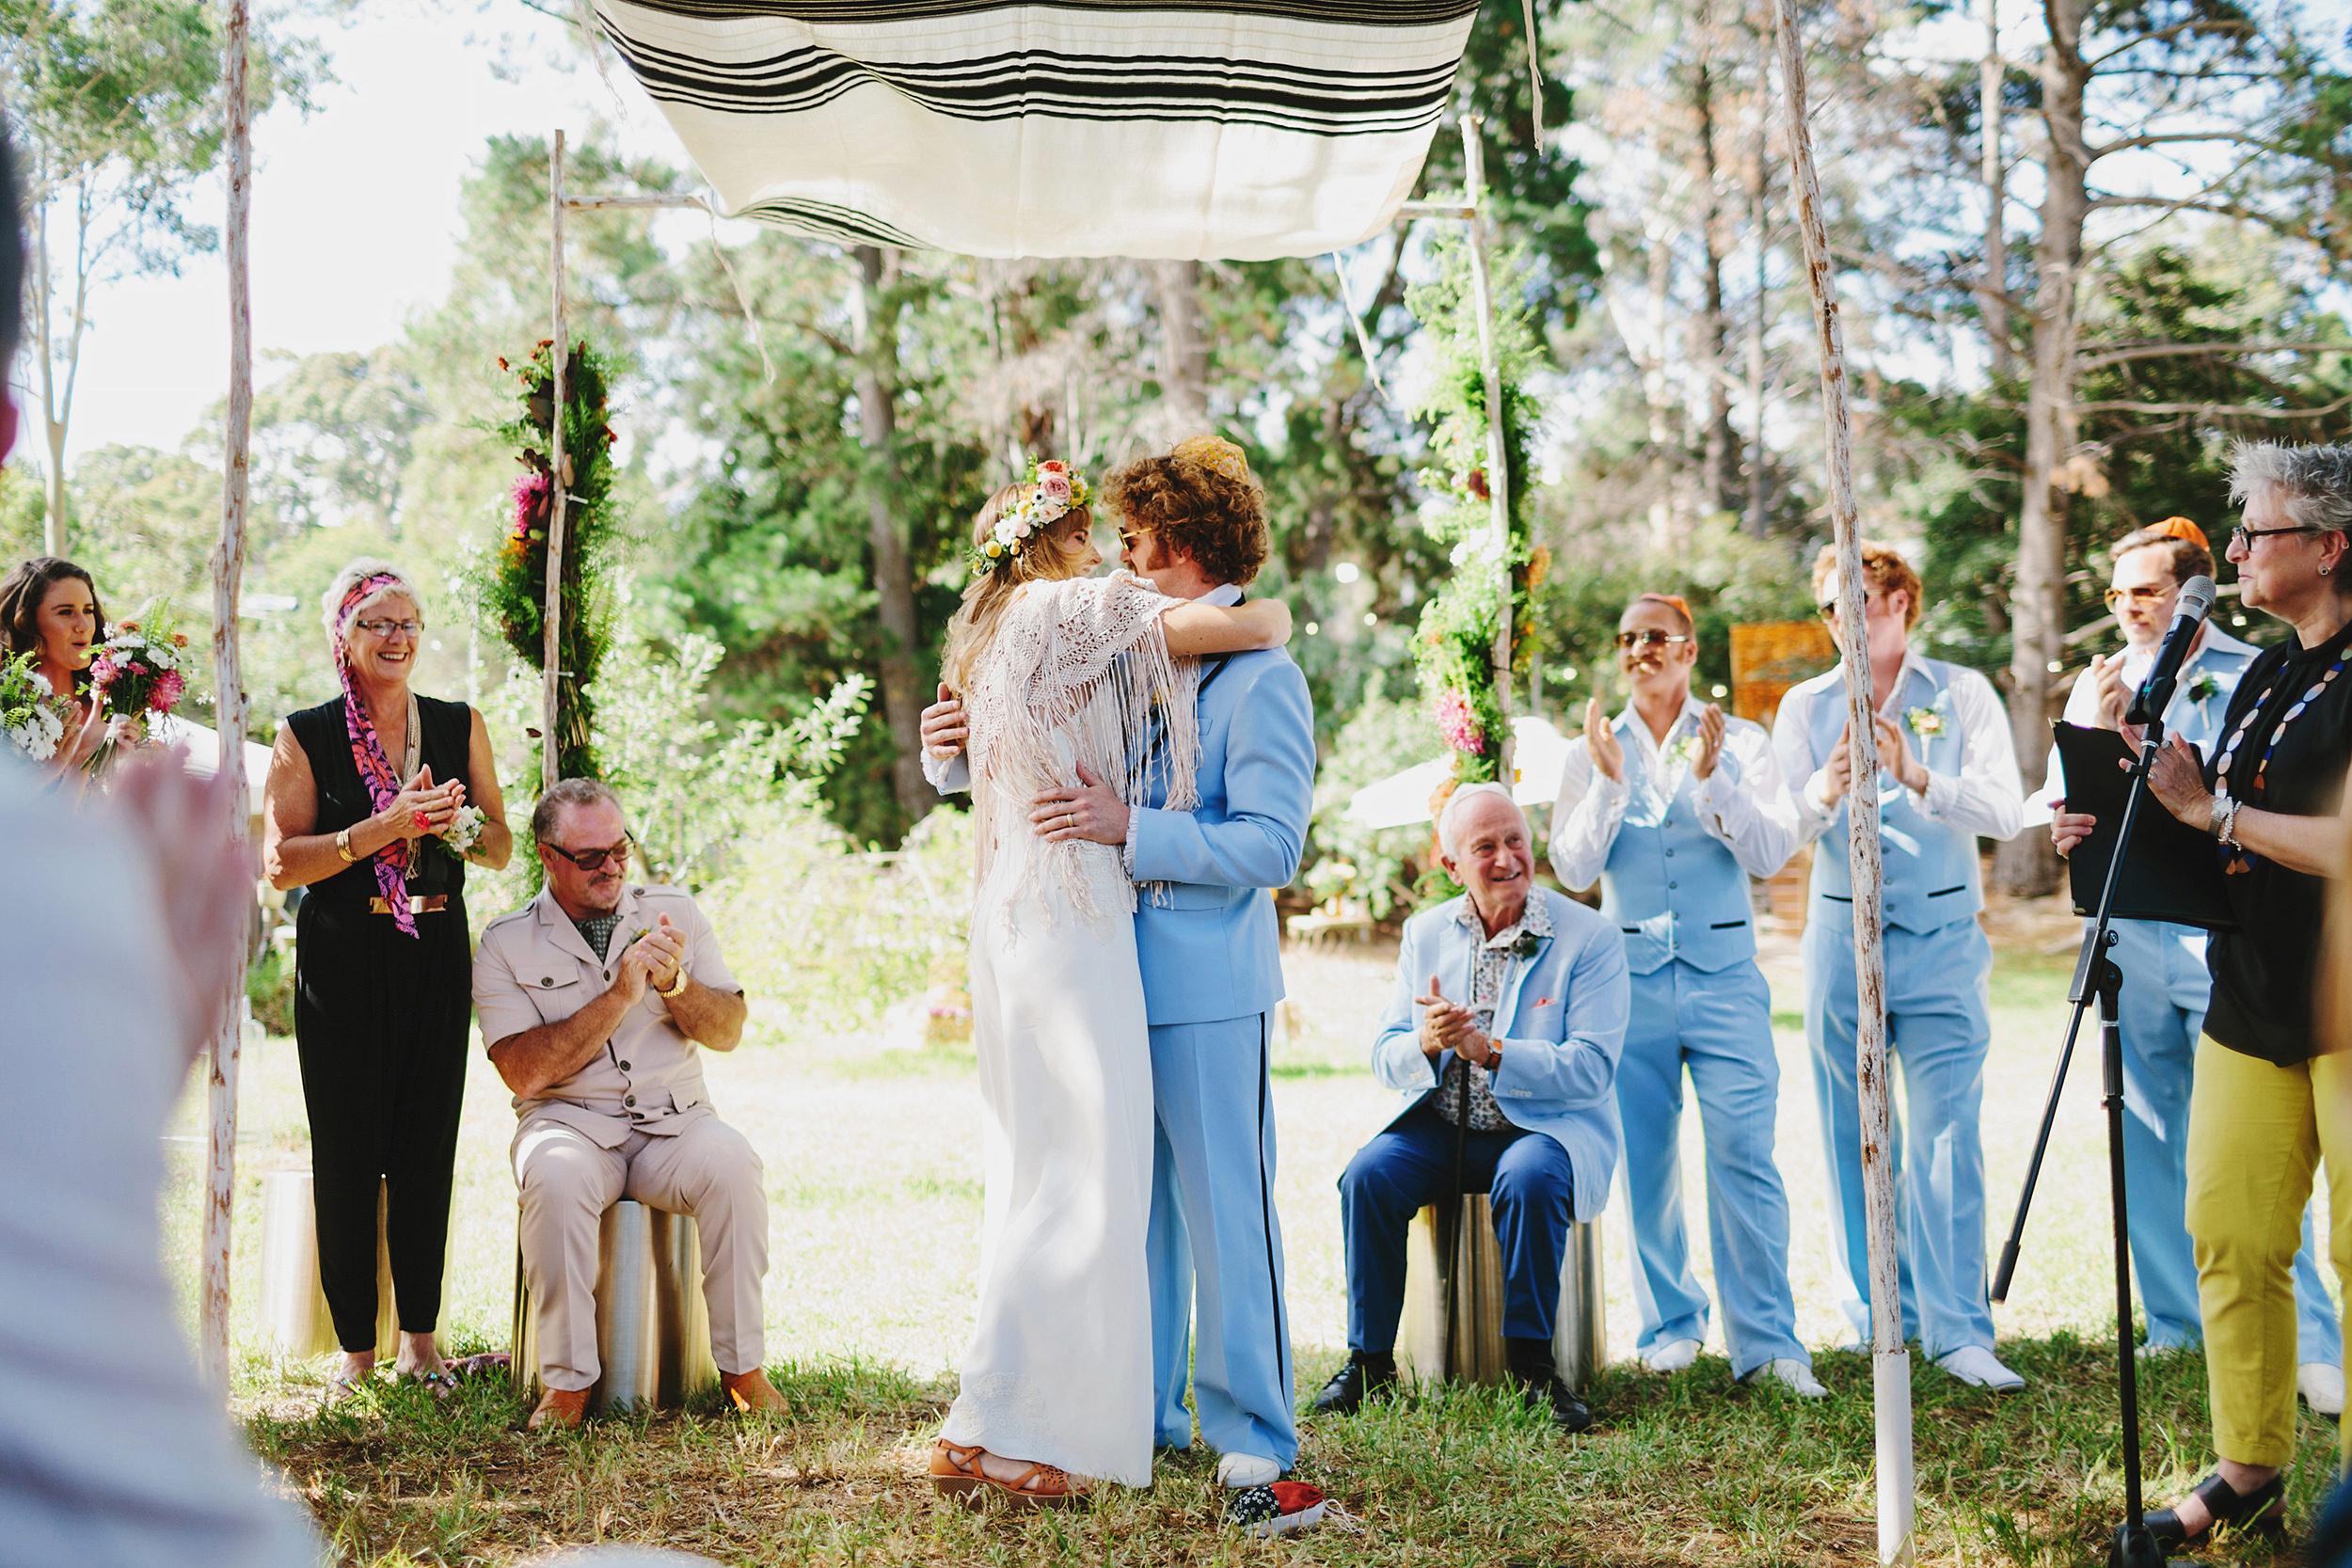 Melbourne_Vintage_Backyard_Wedding_Ben_Erin 038.JPG